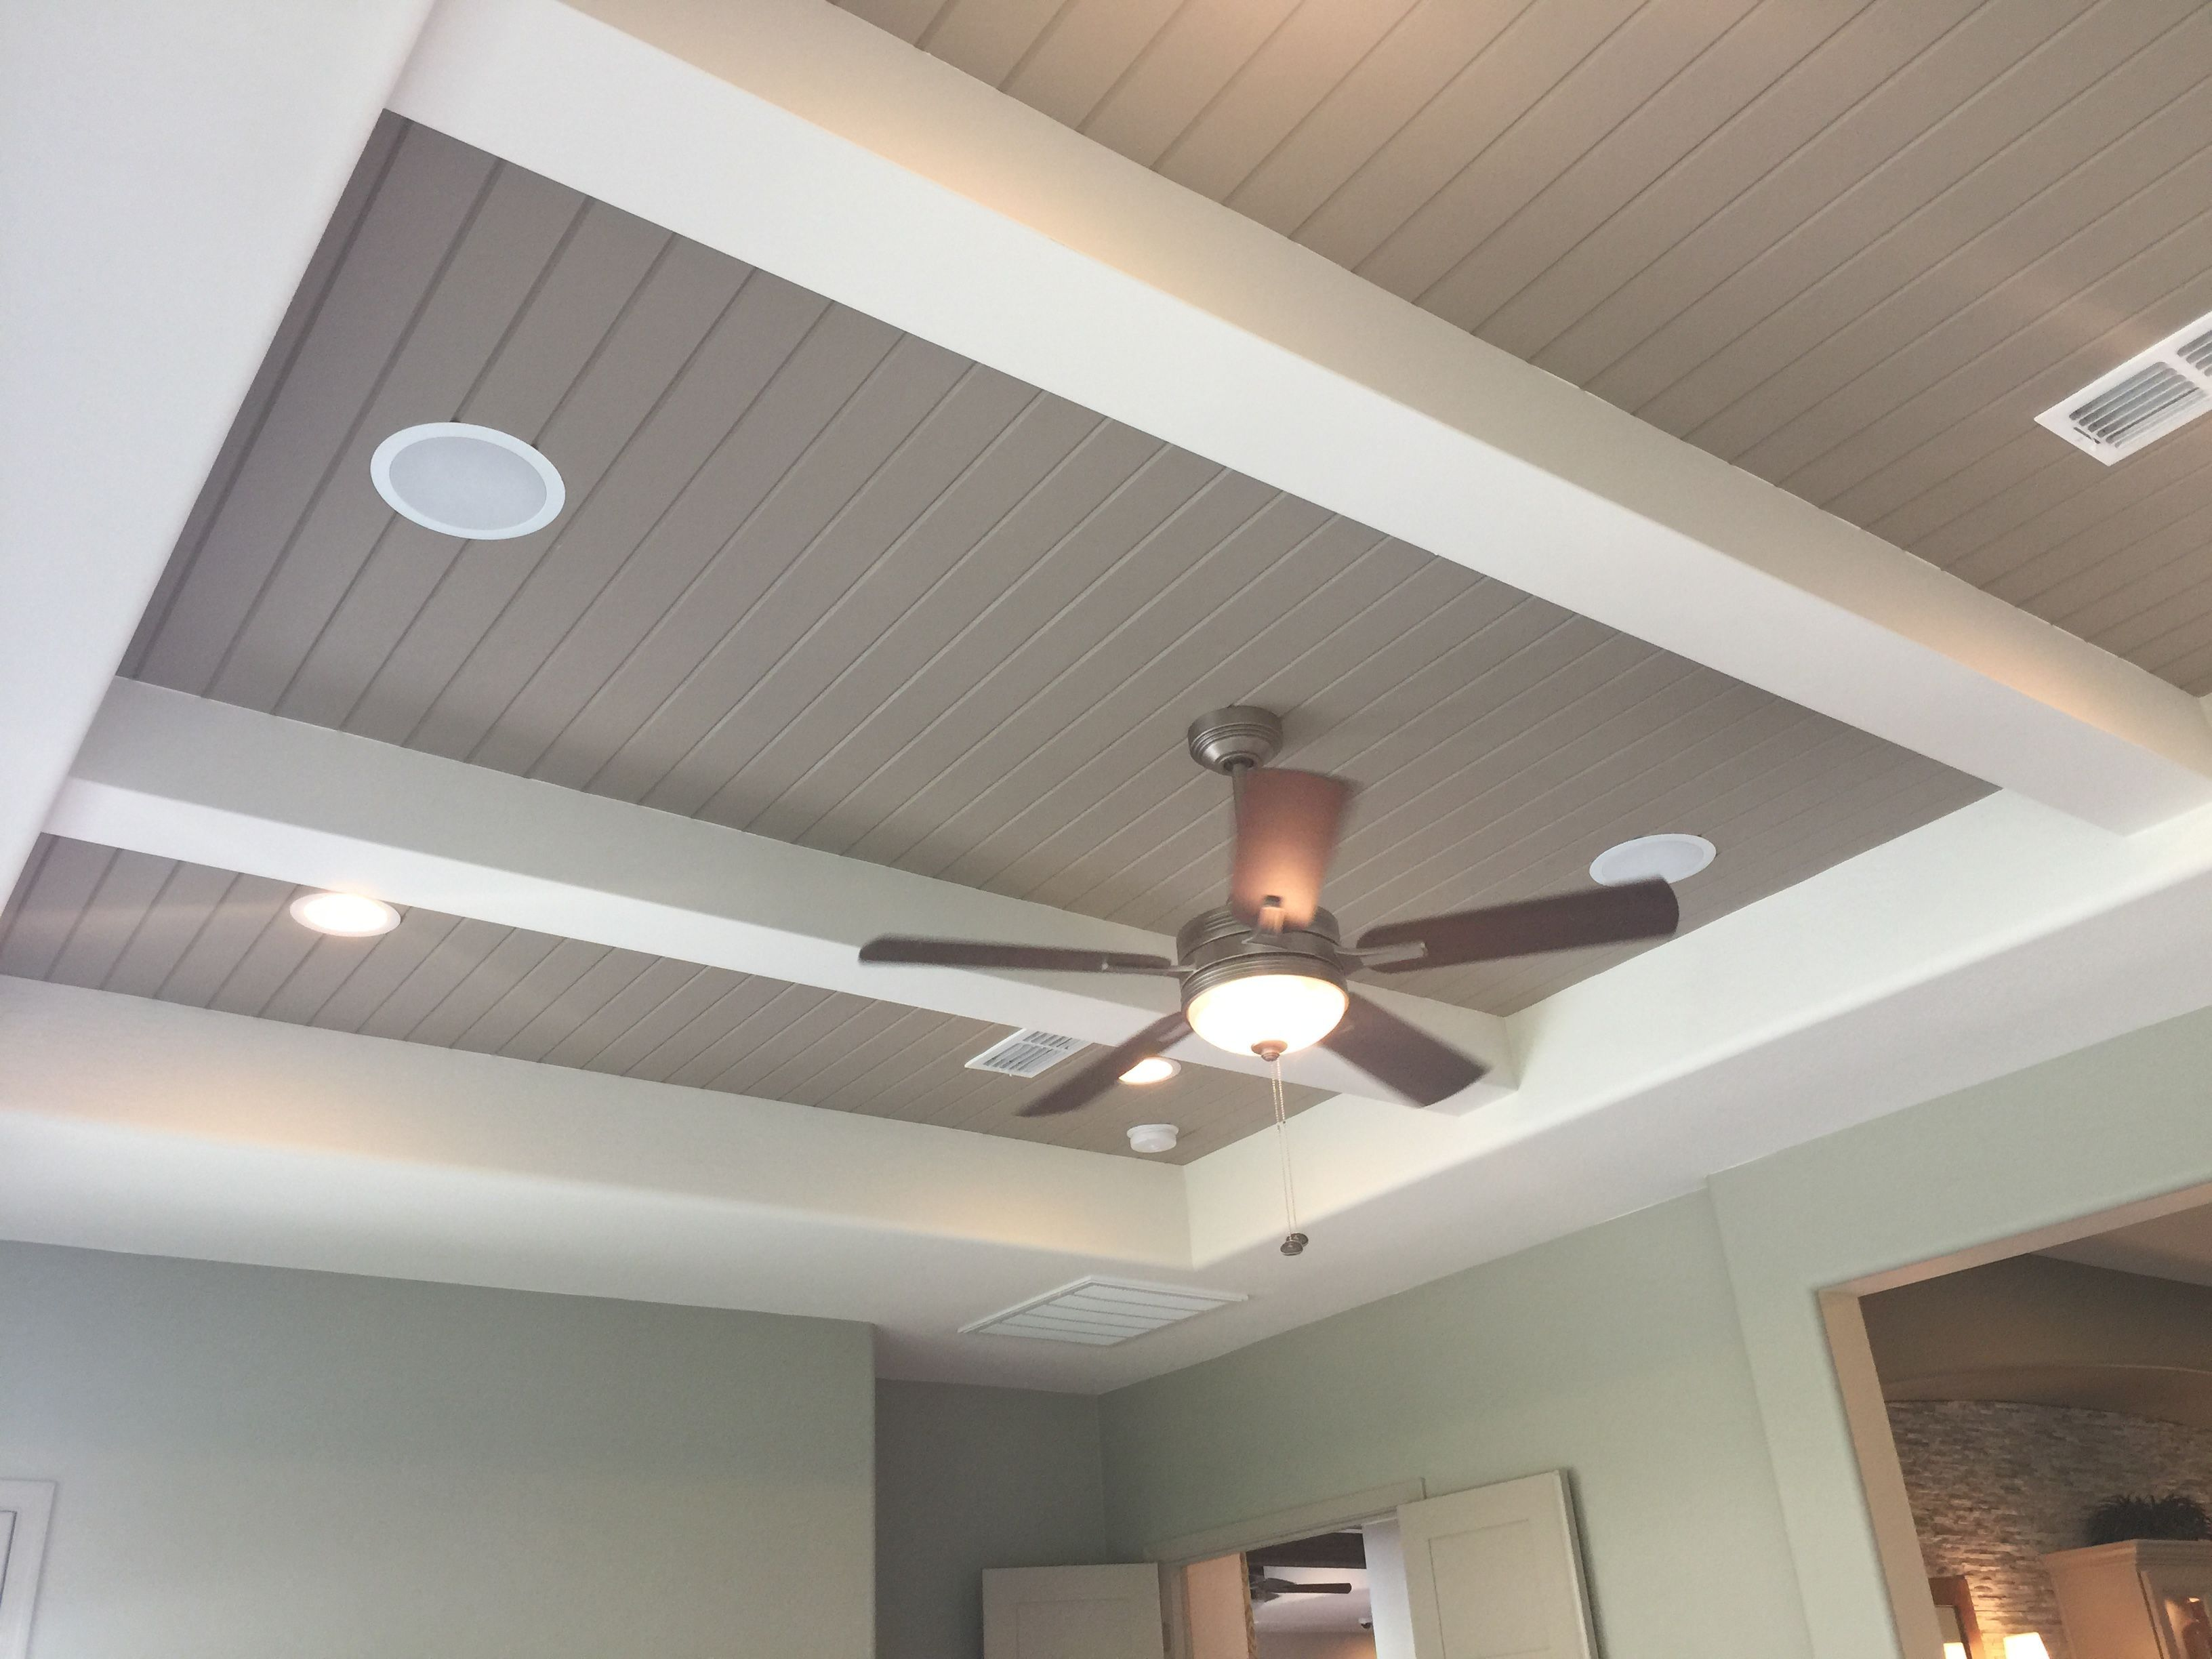 FalseCeilingDiningFloors  False Ceiling Dining Floors  Pinterest